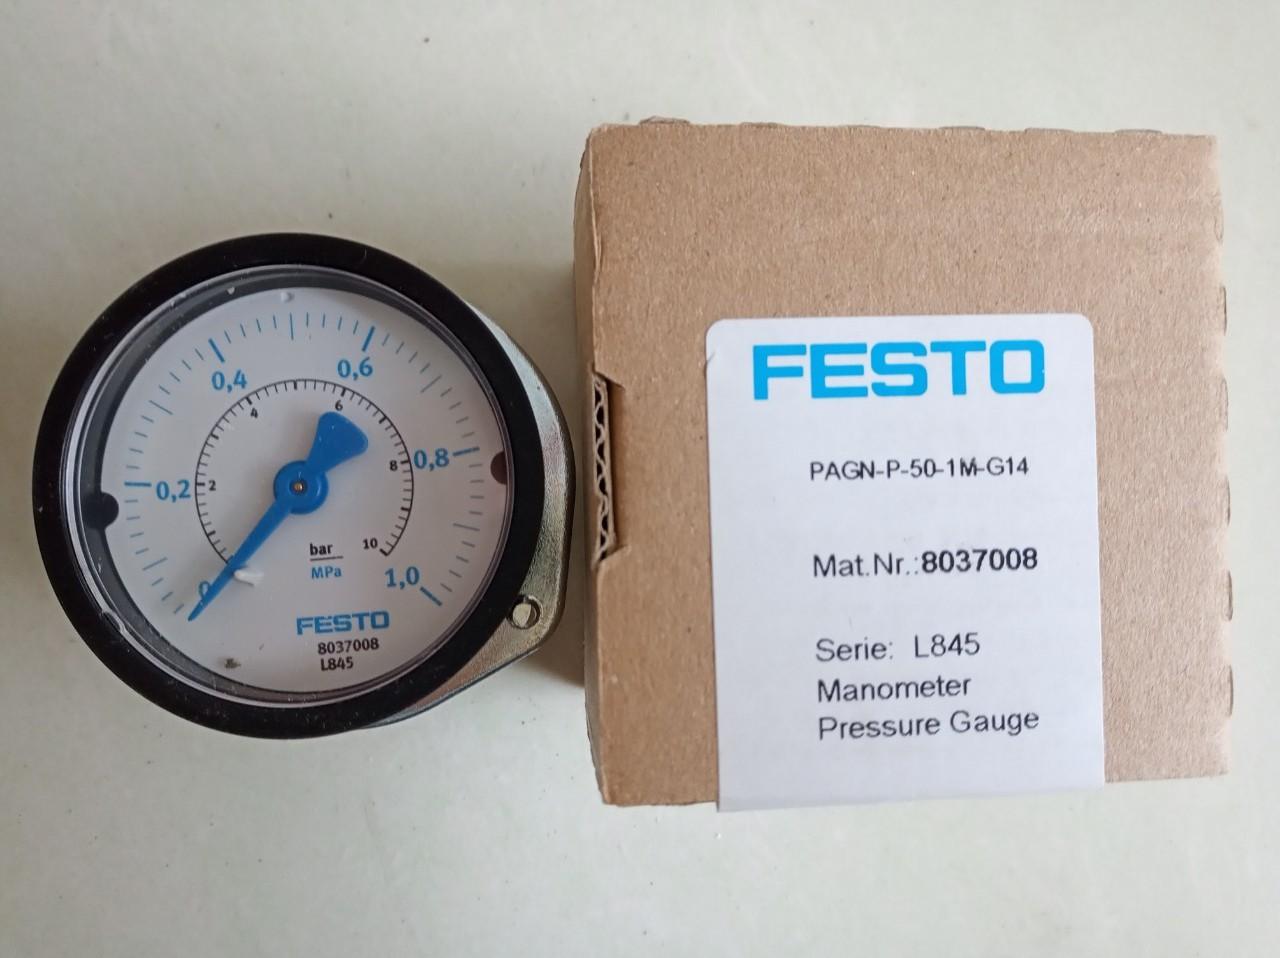 Đồng hồ FESTO PAGN-P-50-1M-G14